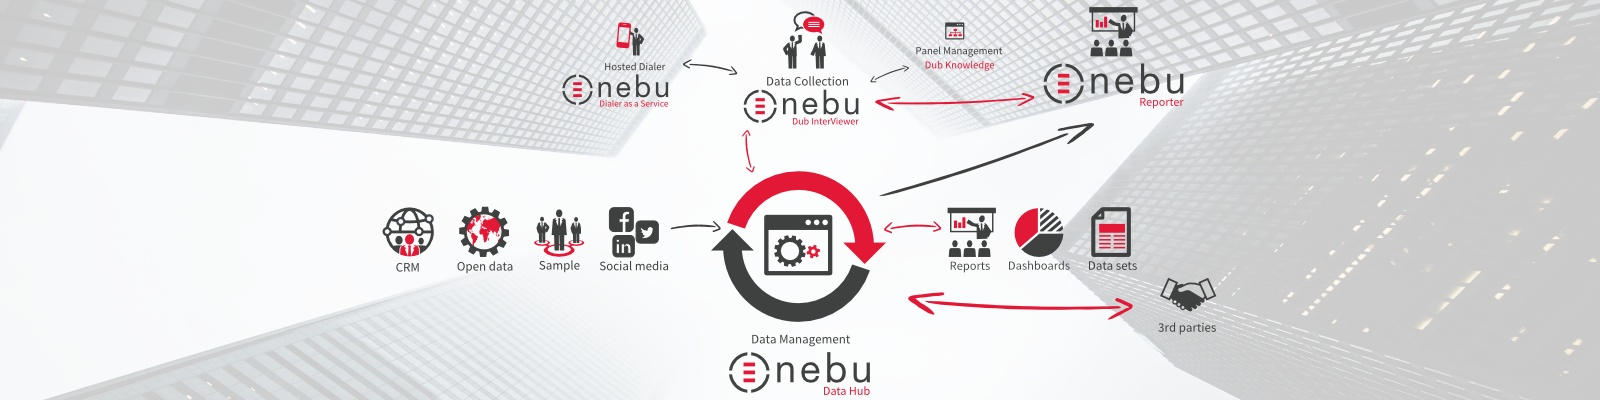 NebuDataSuite_1600.jpg